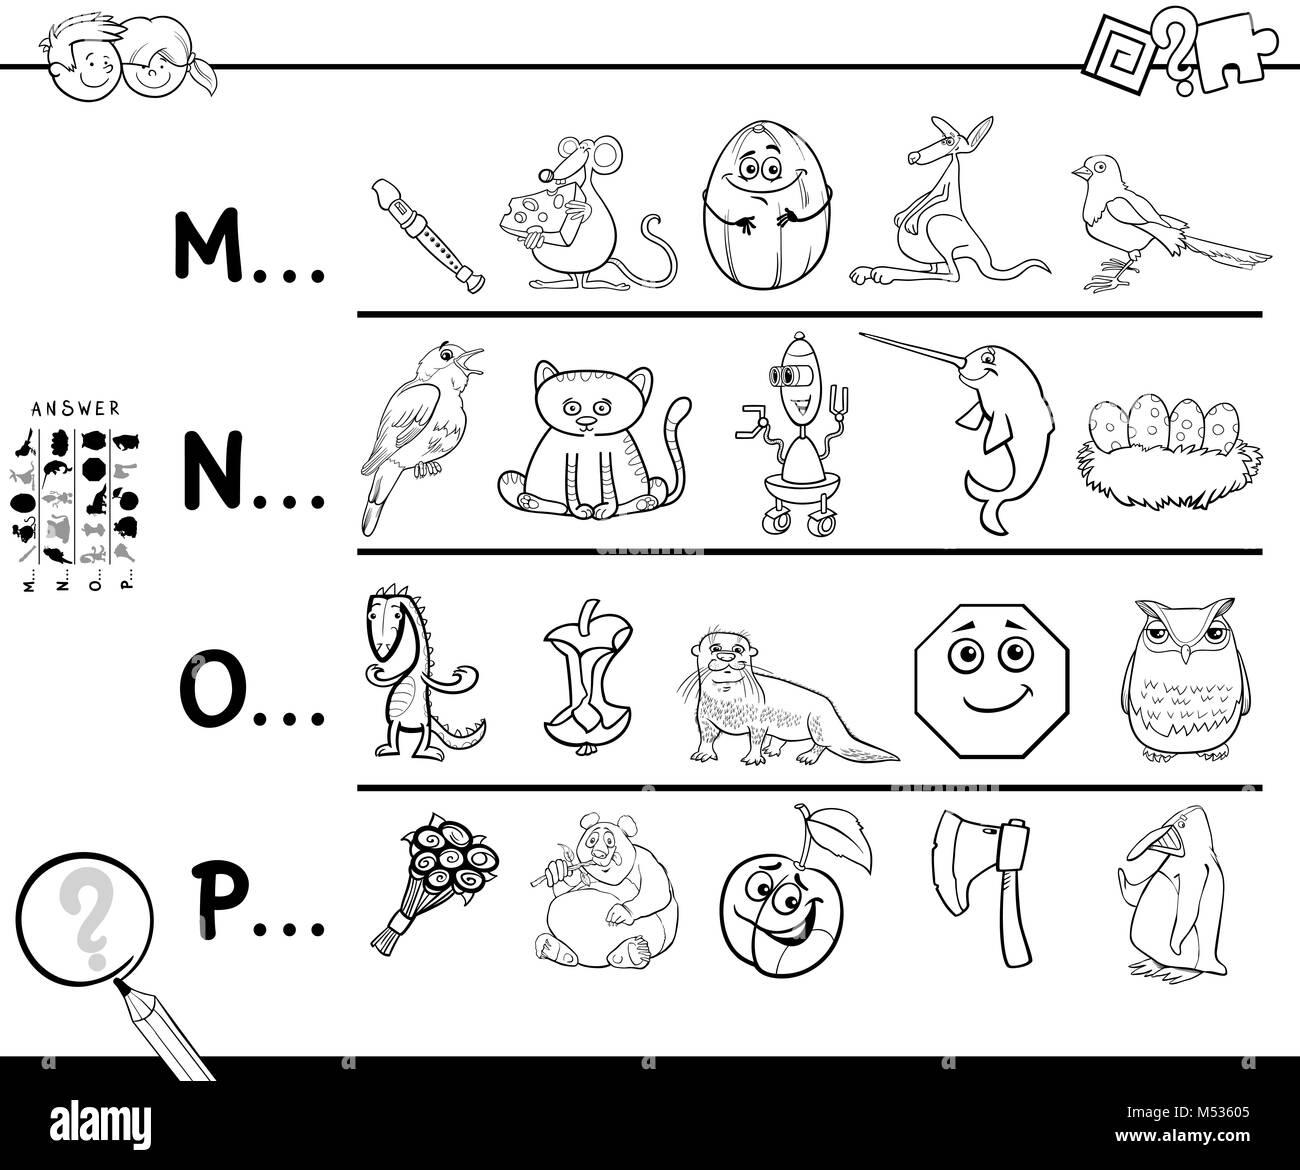 Increíble Letras De Burbujas Para Colorear Molde - Dibujos Para ...